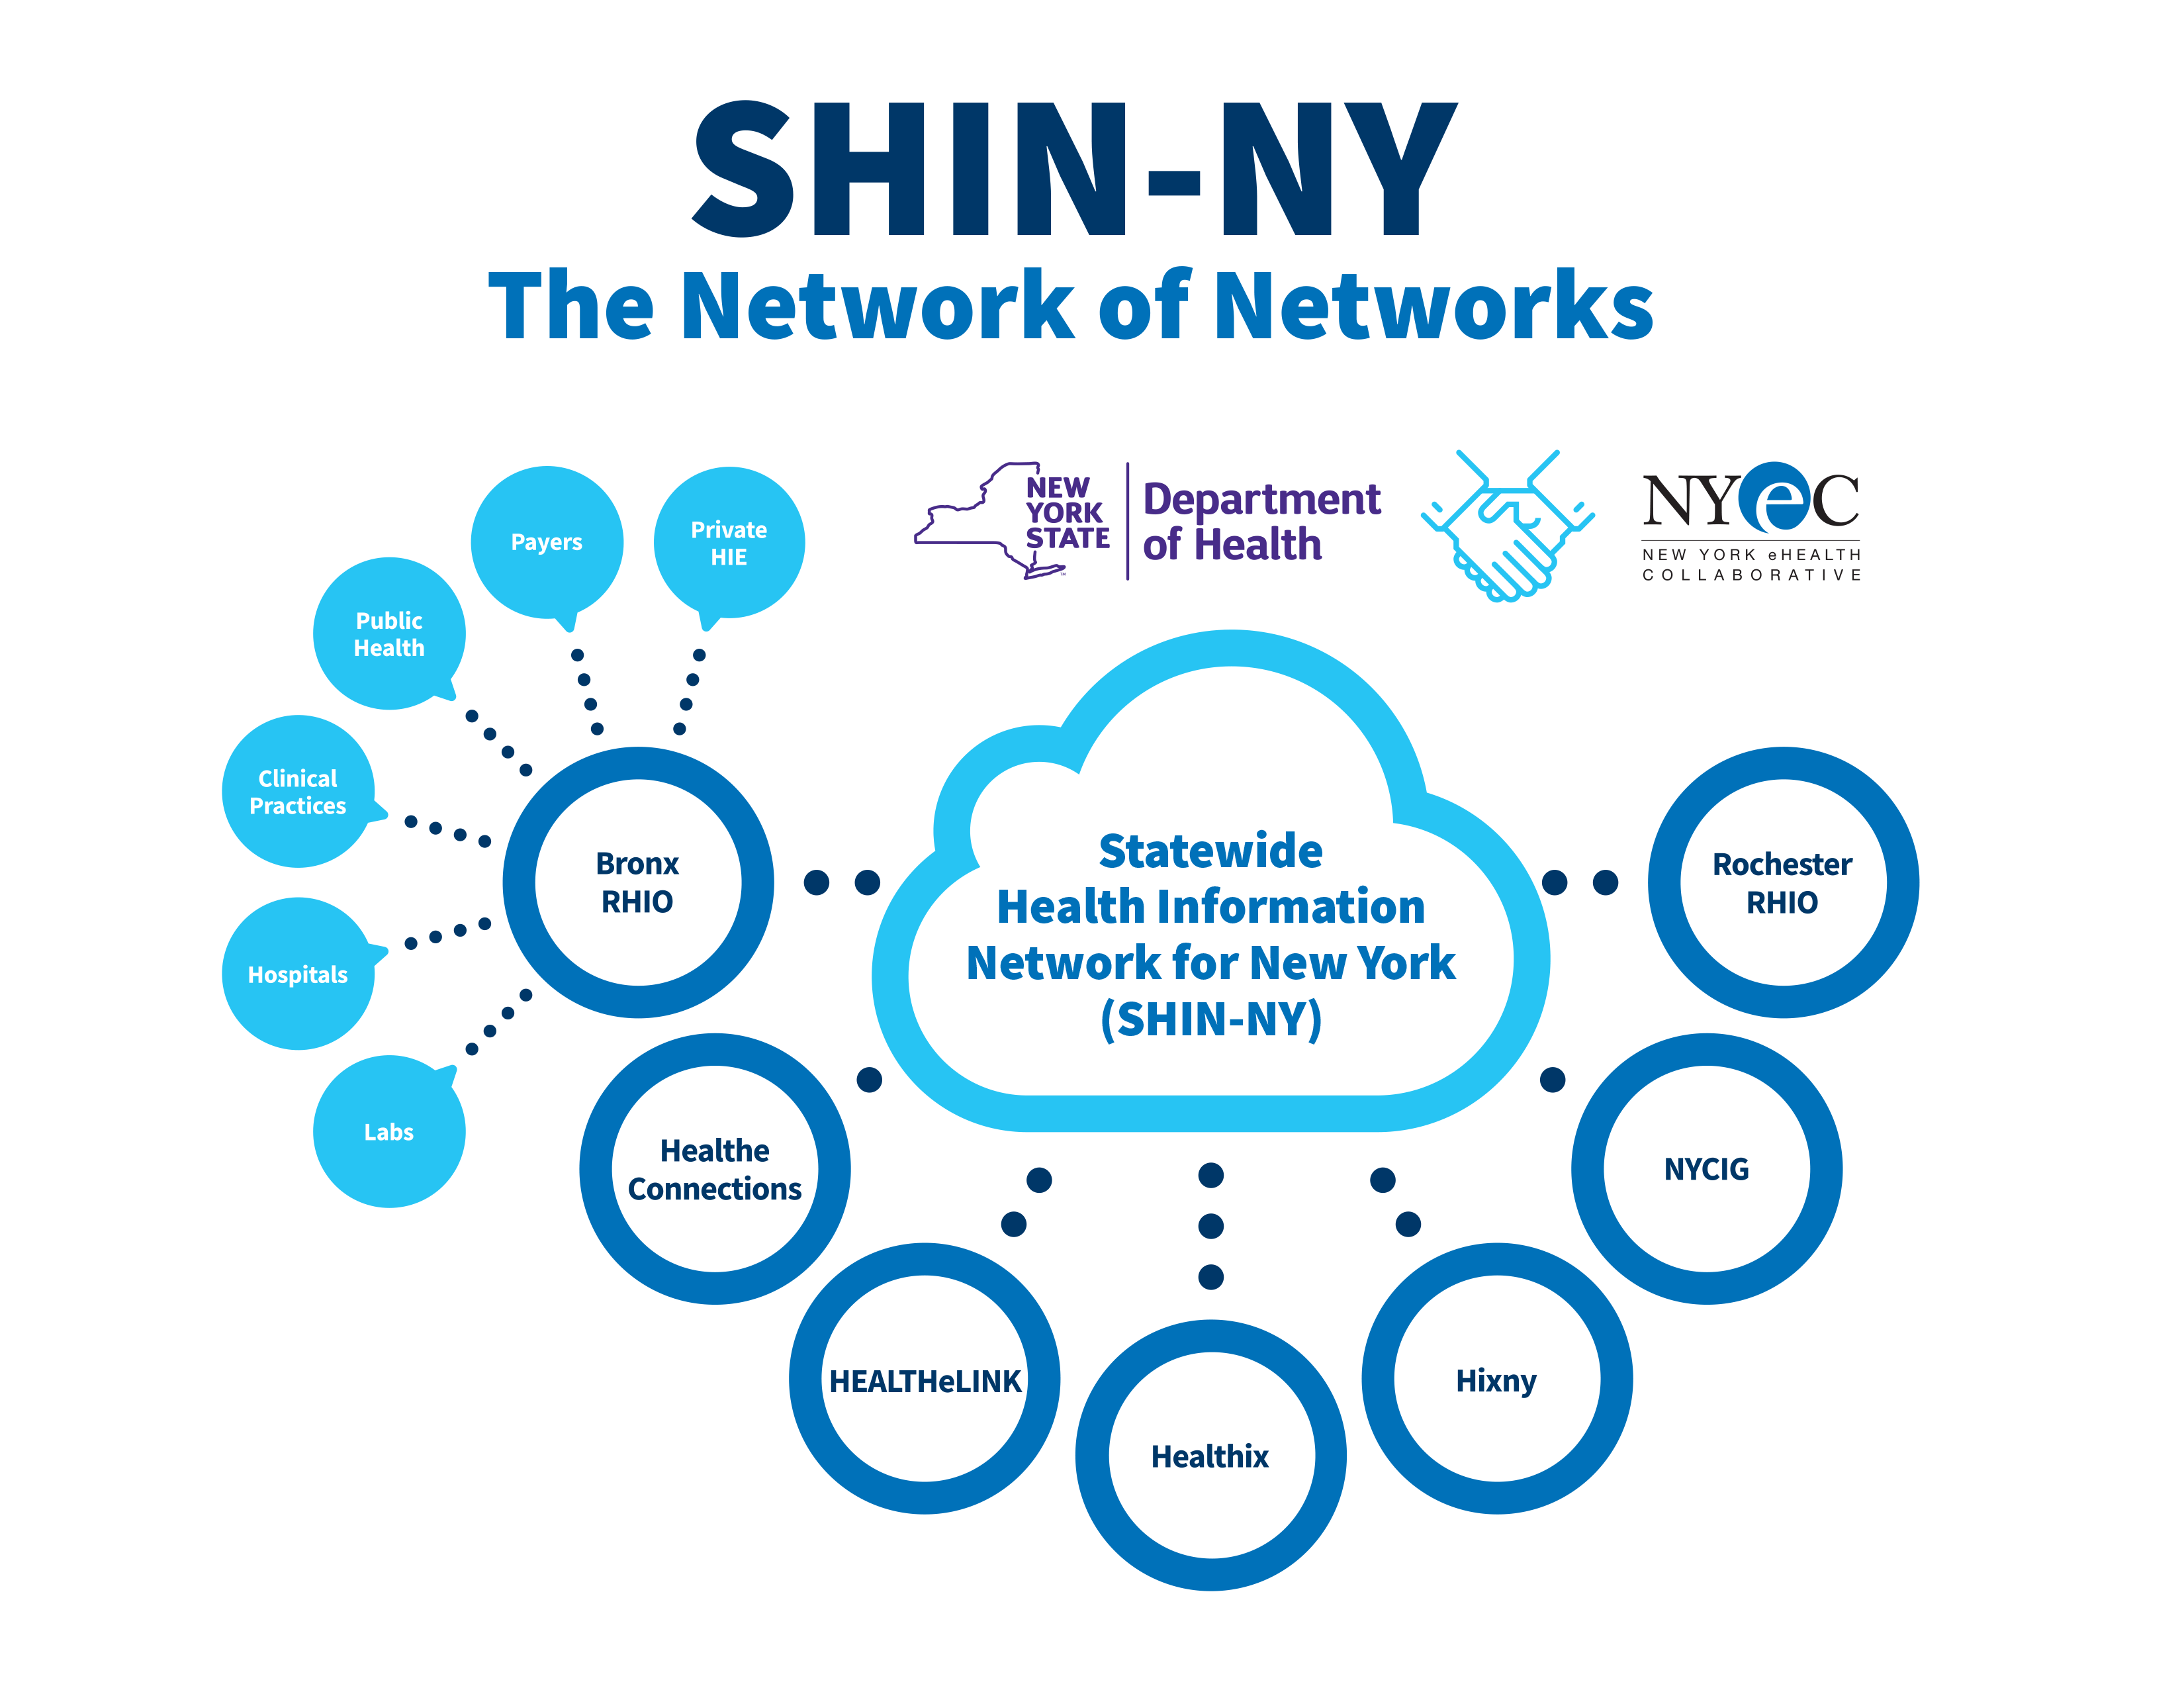 SHIN-NY Cloud and Contributors with logos